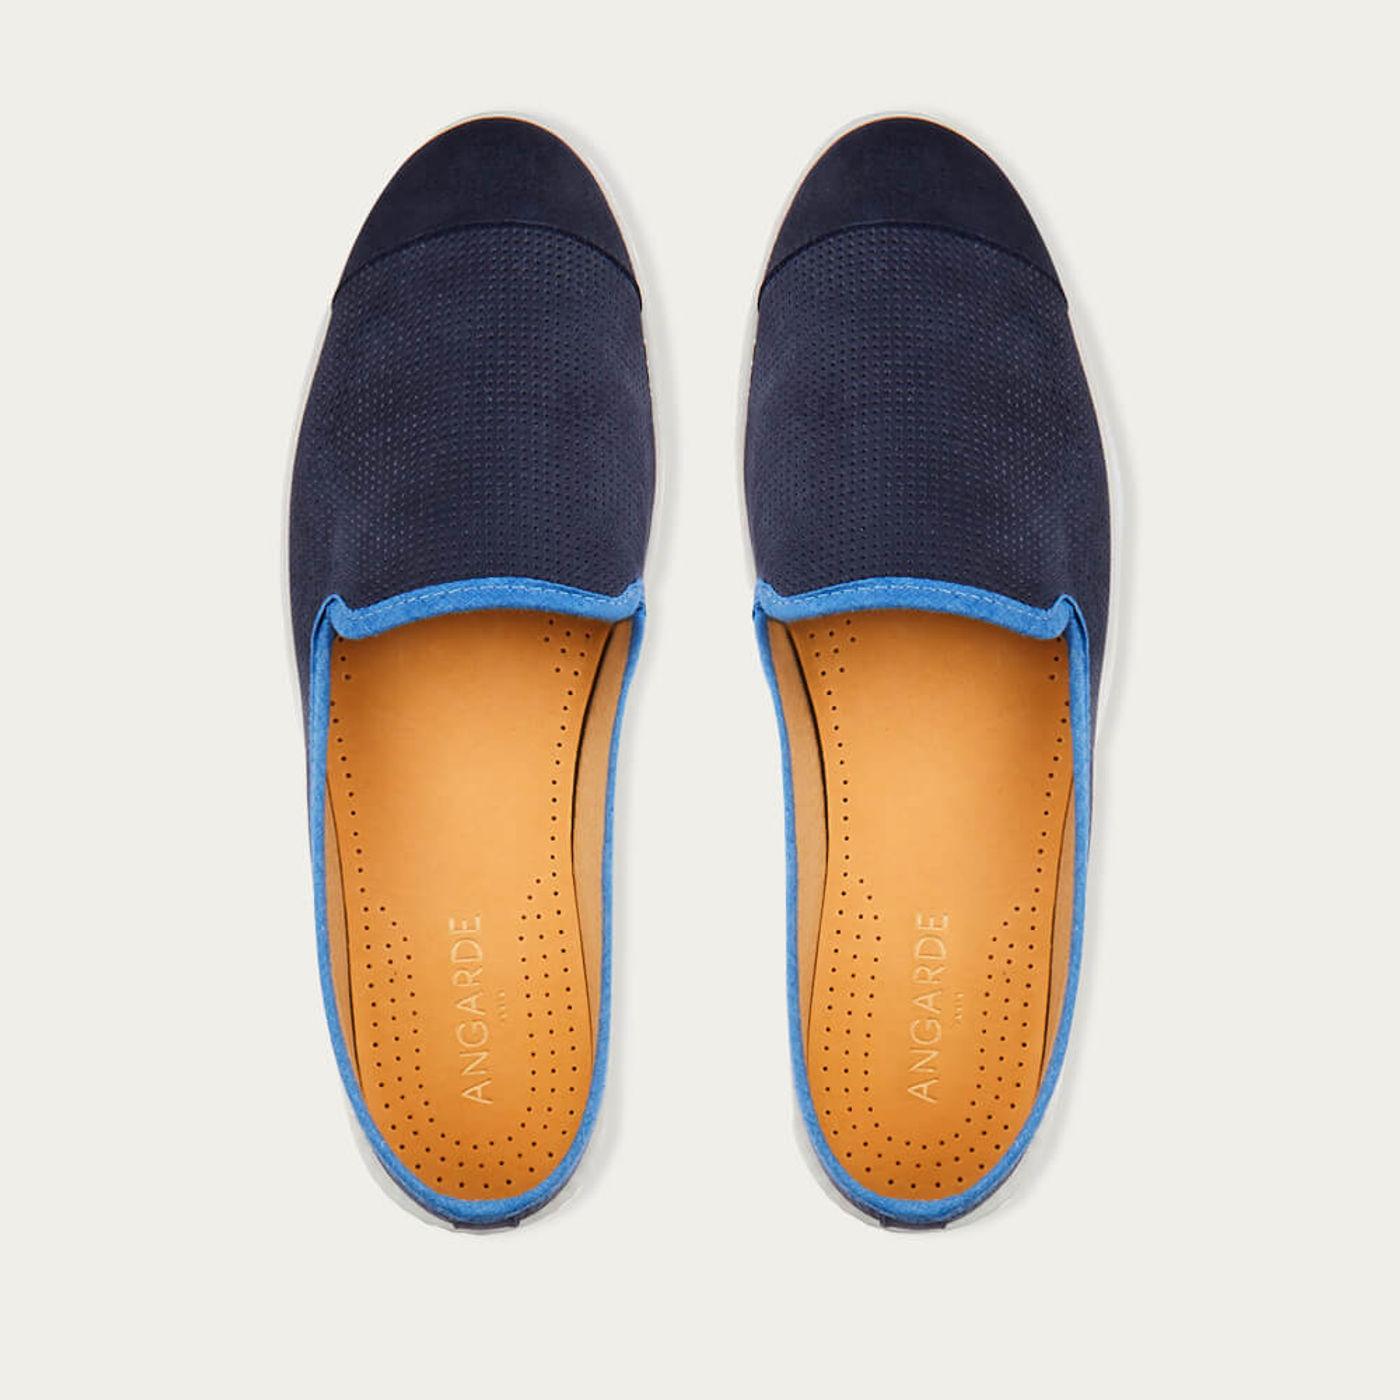 Indigo Blue Men's Espadrille Slip-On Leather | Bombinate